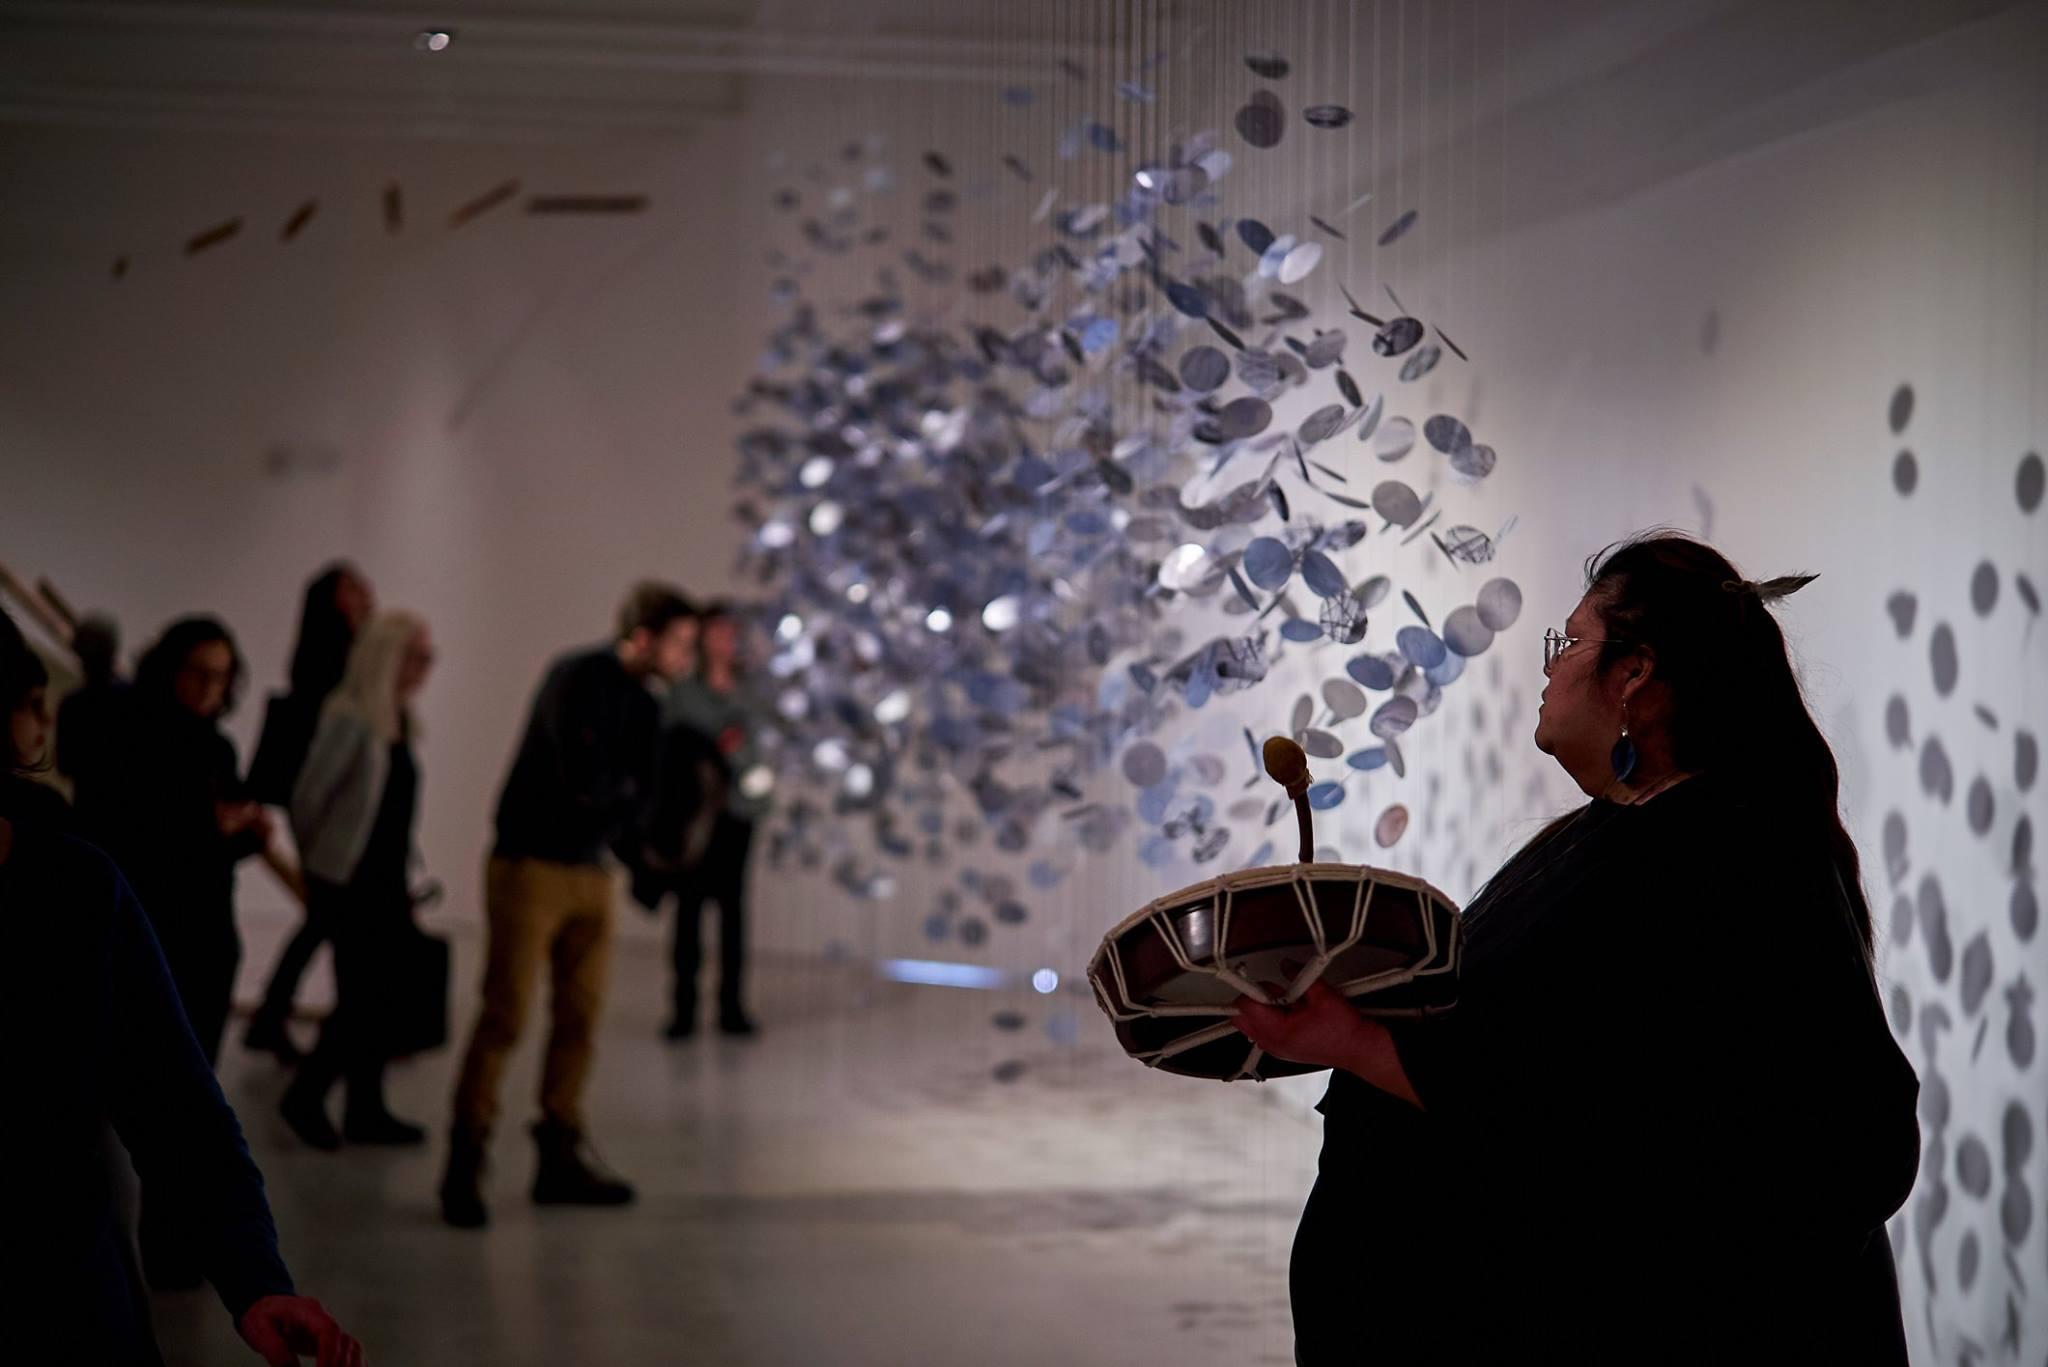 Hannah Claus, water song [Kinosipi] (exhibition view with Karine Wasiana Echakwan), 2019. Photographer: Romain Guilbault